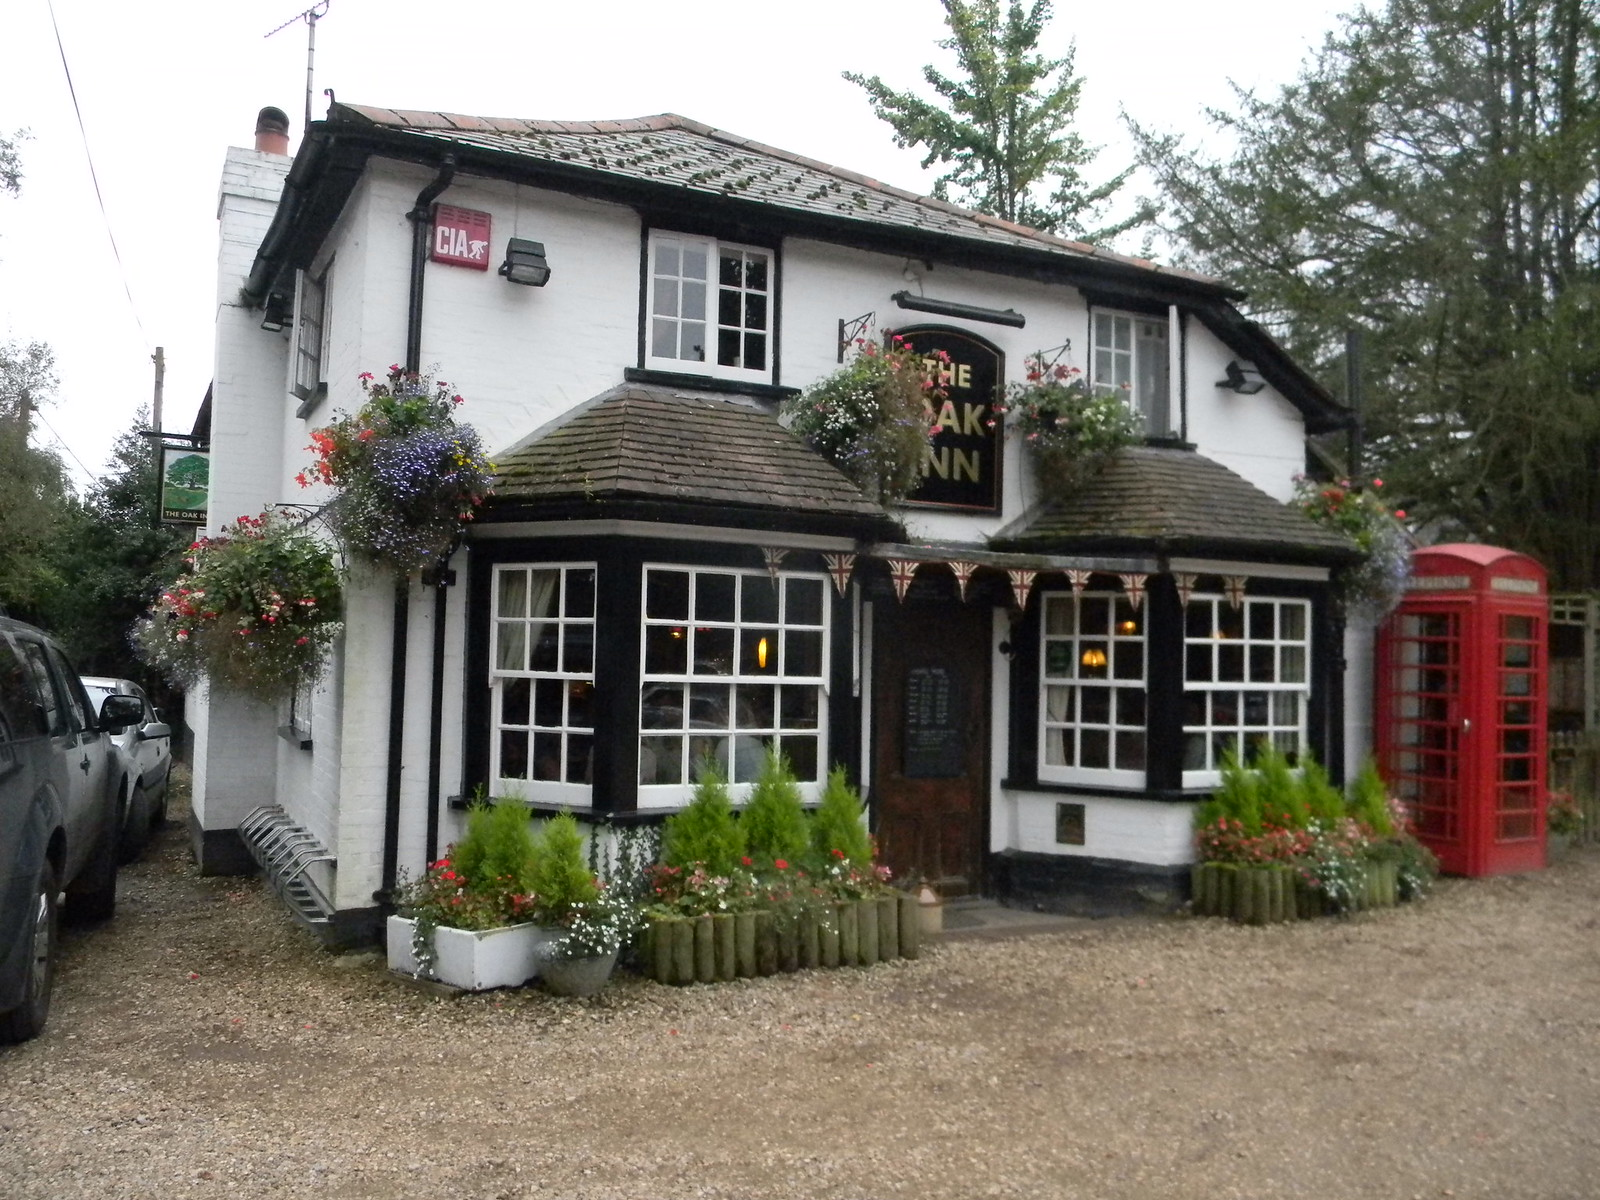 The Oak Inn Brockenhurst Circular